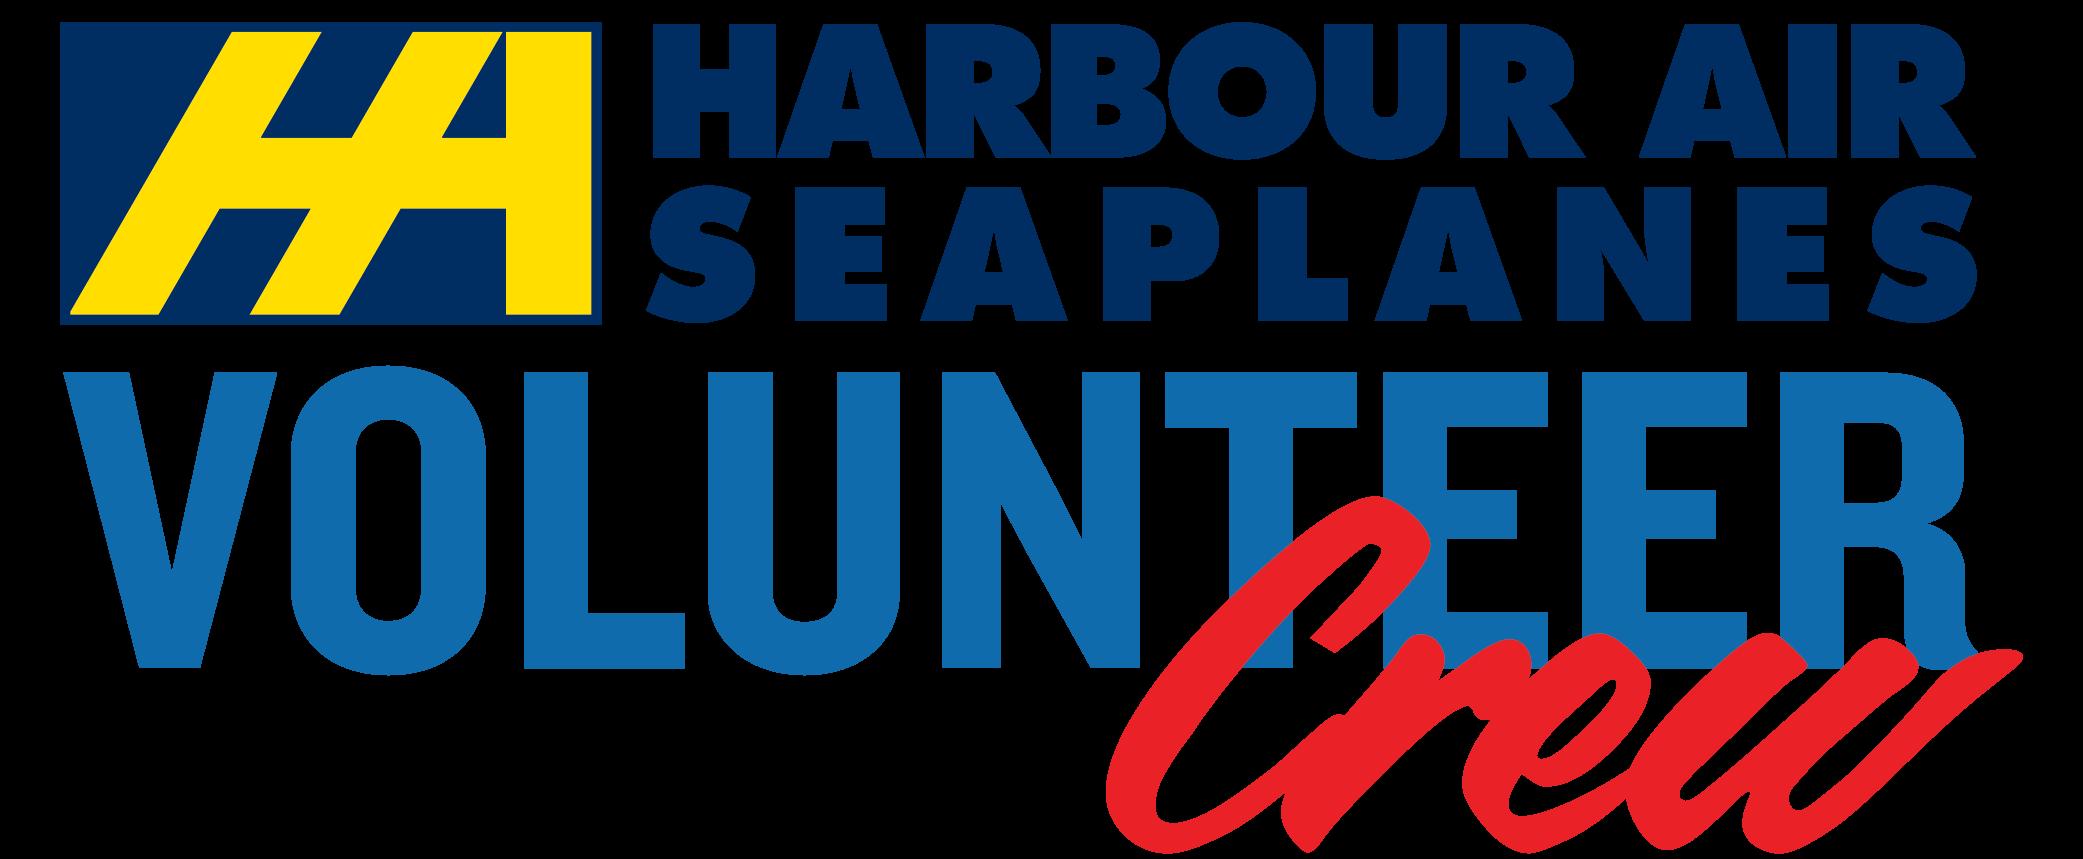 Harbour-air-volunteer-crew-logo-01